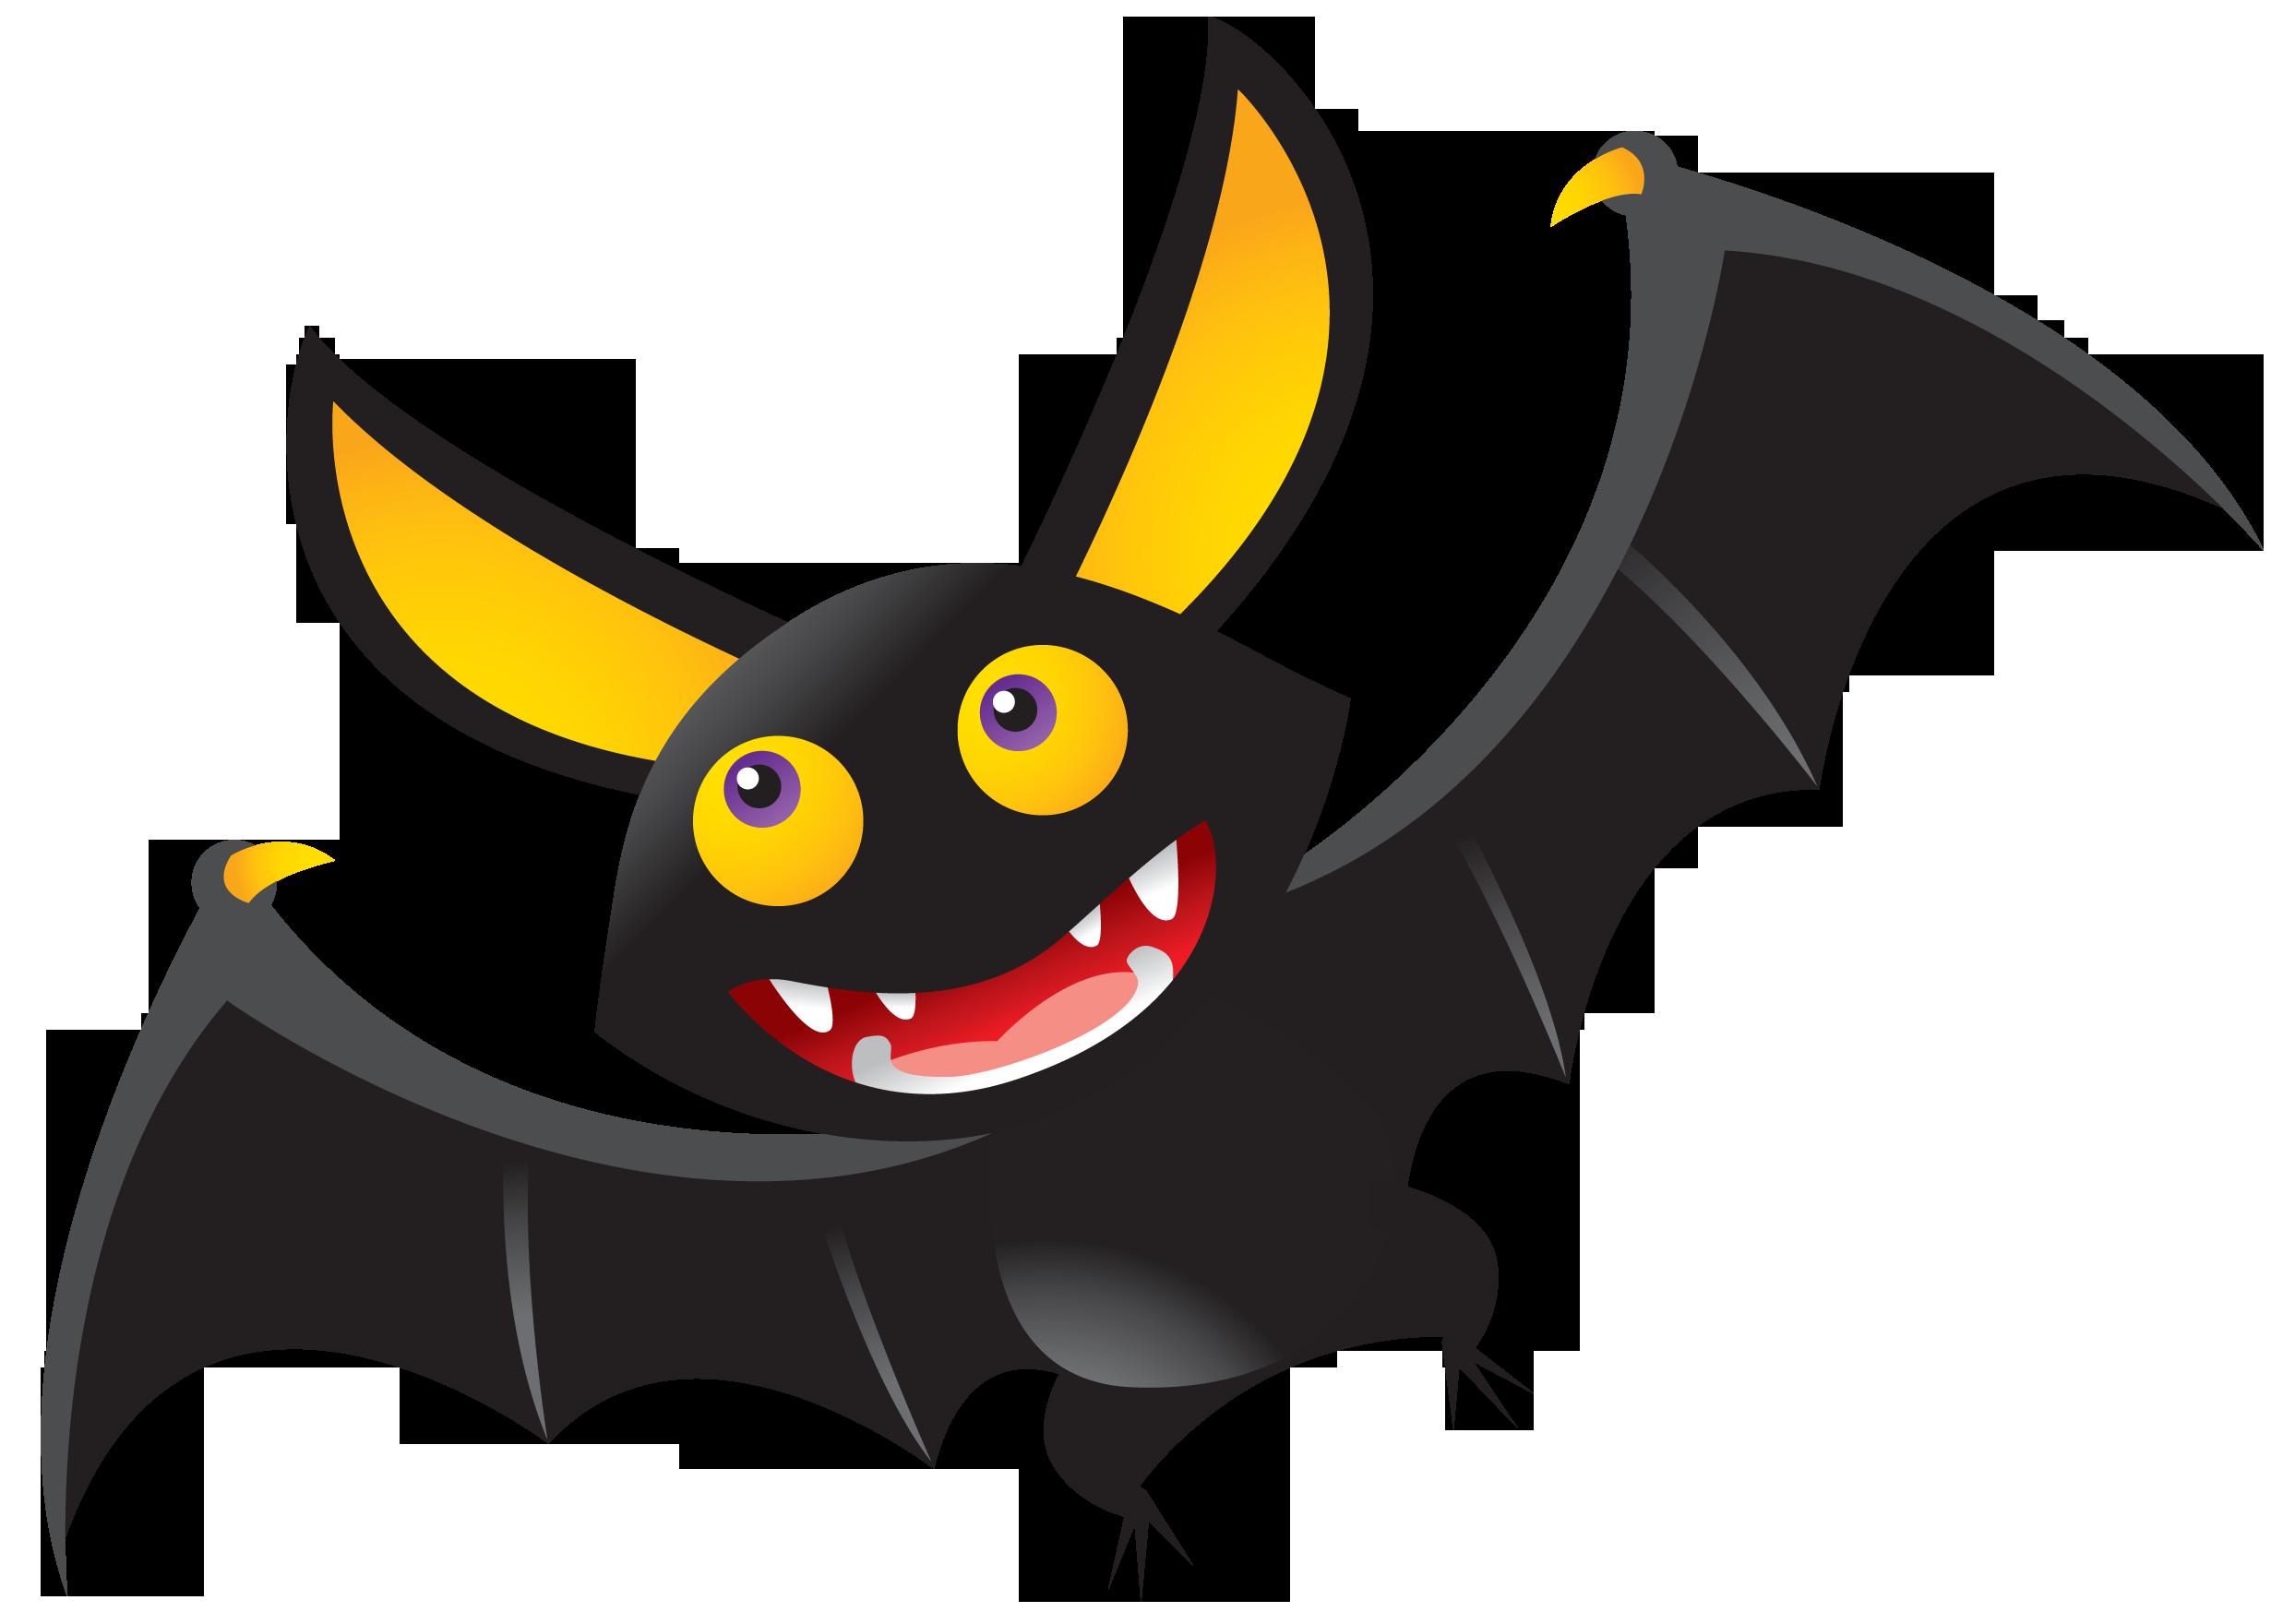 halloween png hd. Bat clipart transparent background